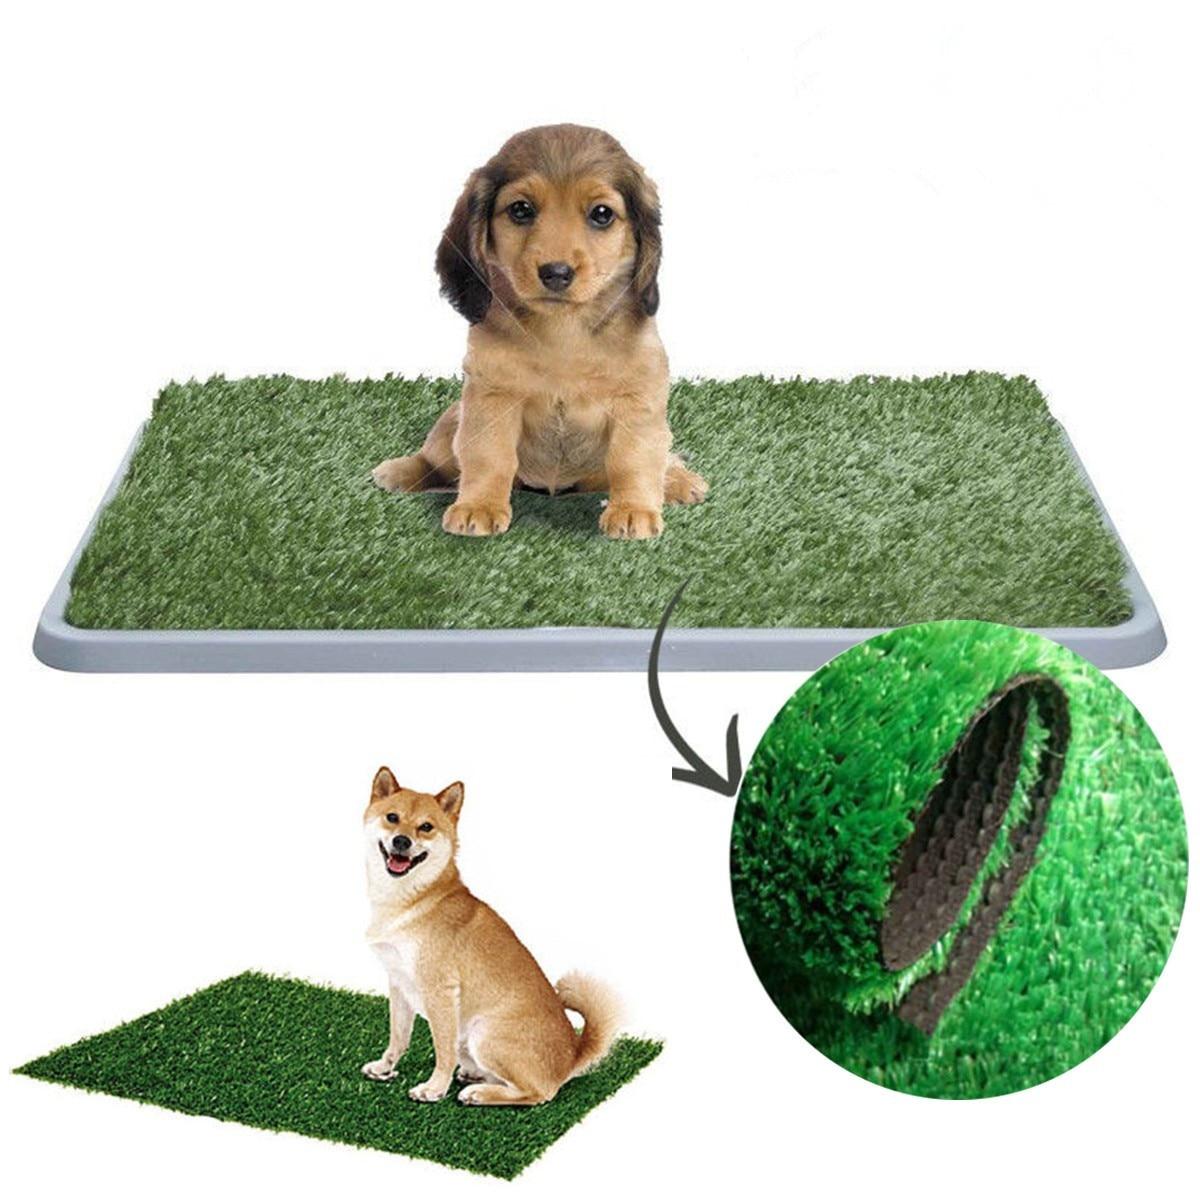 M/L Outdoor Pet Dog Cat Toilet Litter Box Artificial PE Grass Mat Indoor Toilet Potty Trainer Grass Turf Pad Dog Pet Supplie